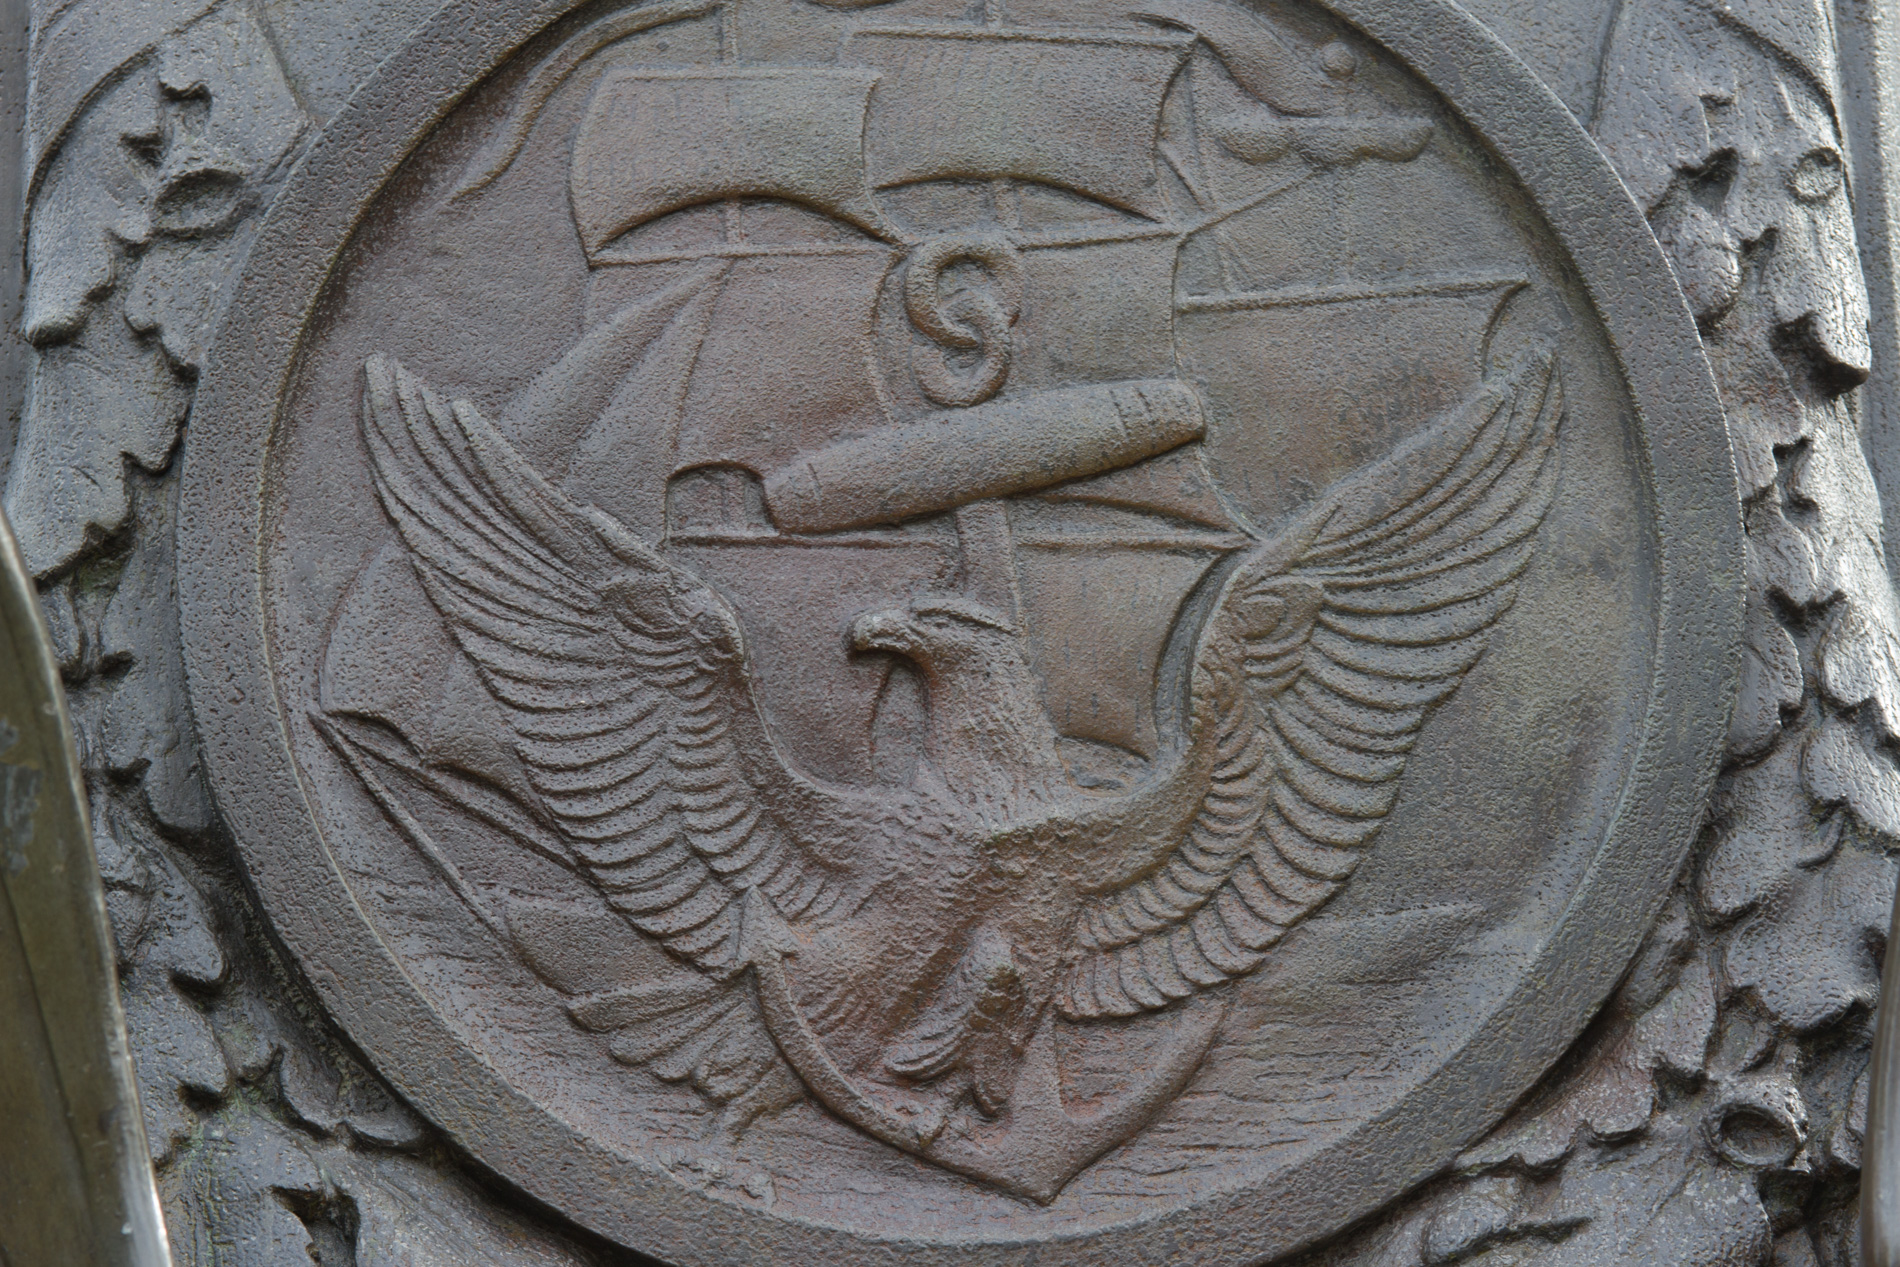 City Employees Memorial [1506]